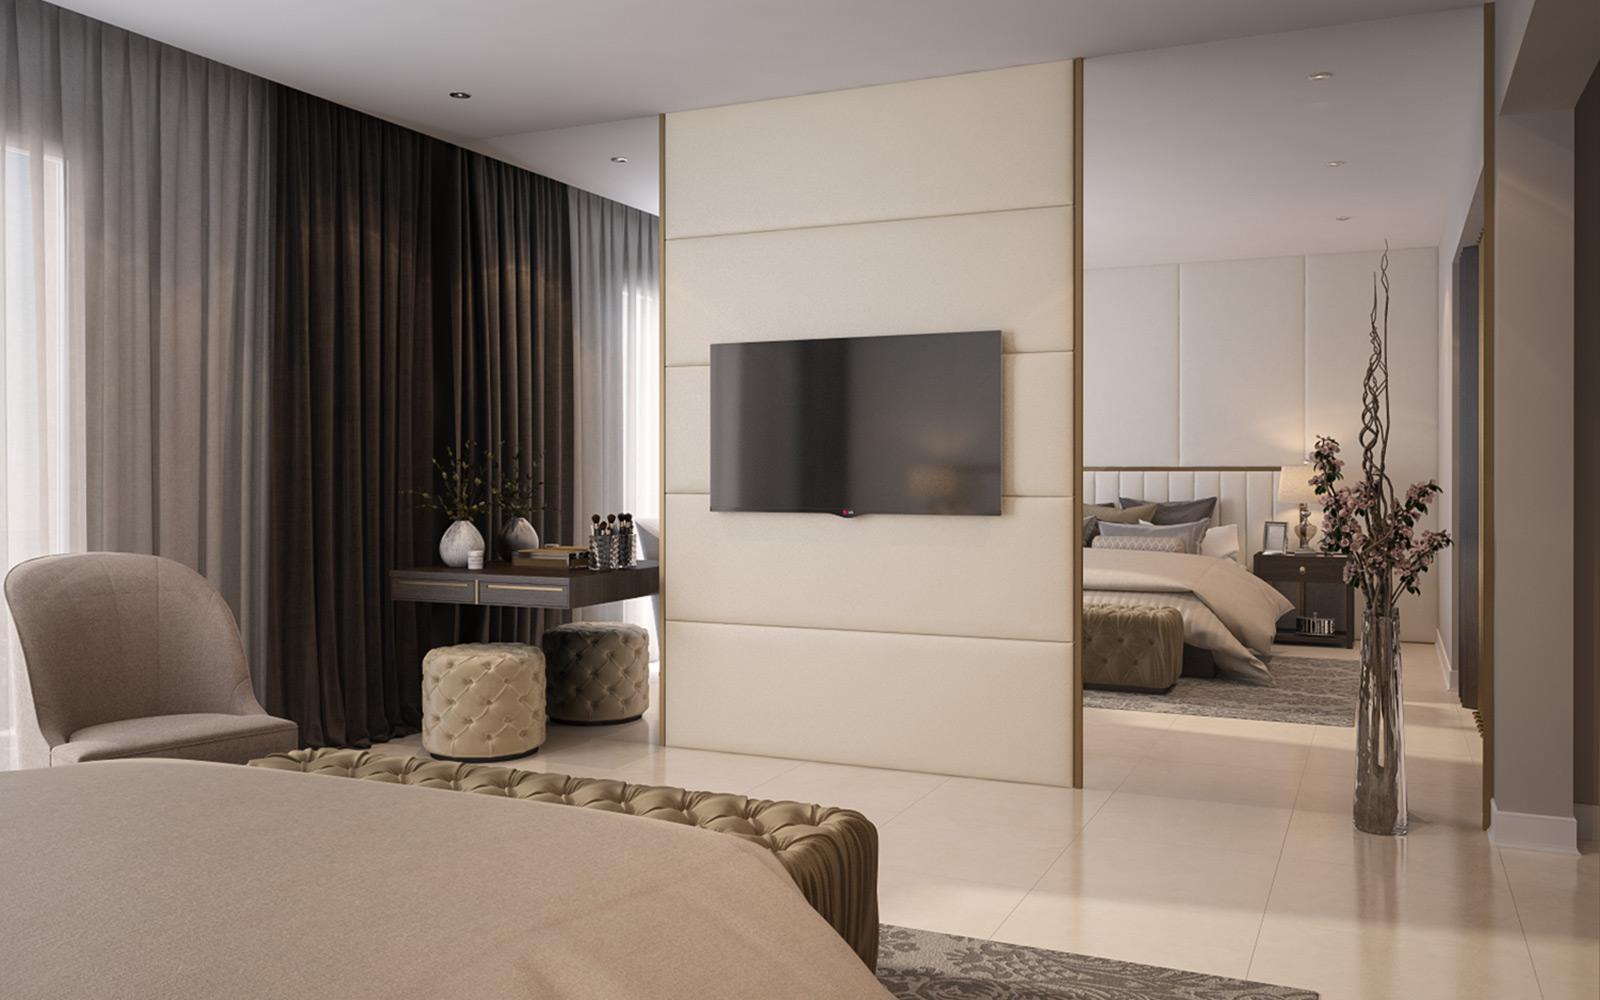 Vogue Design - Saudi Arabia Paleria Flats6